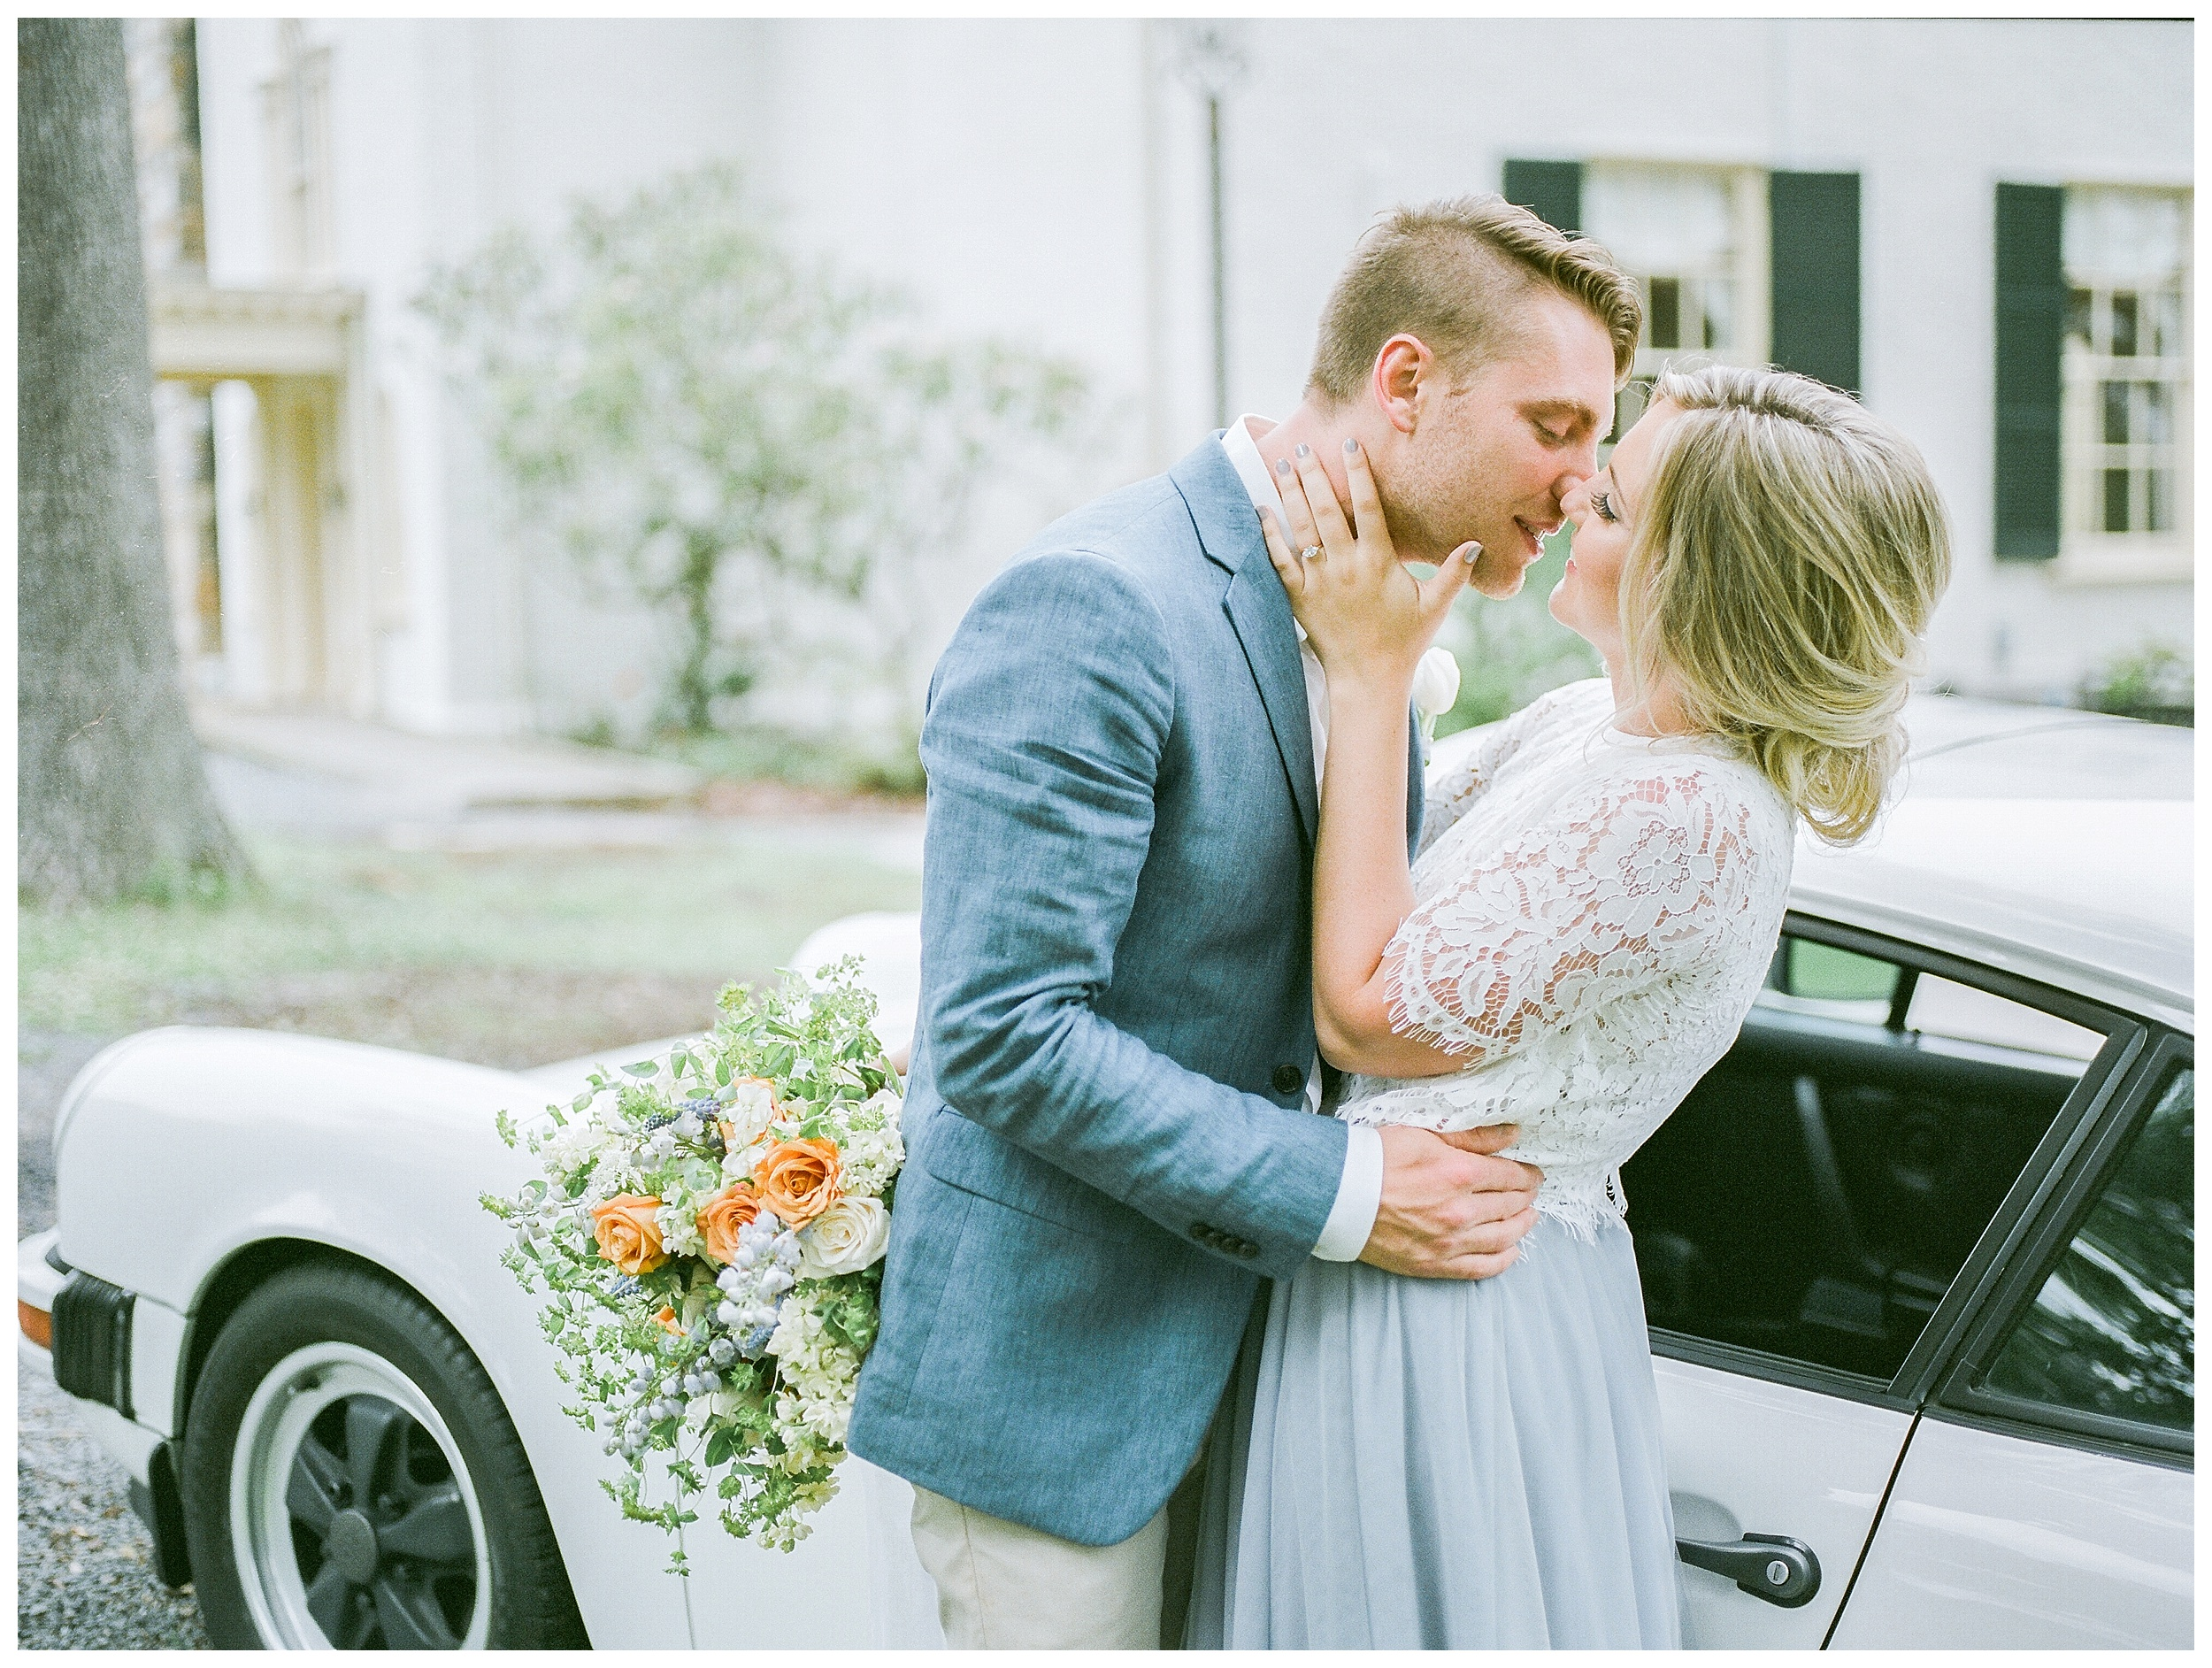 Rust Manor Wedding   Virginia Wedding Photographer Kir Tuben_0015.jpg